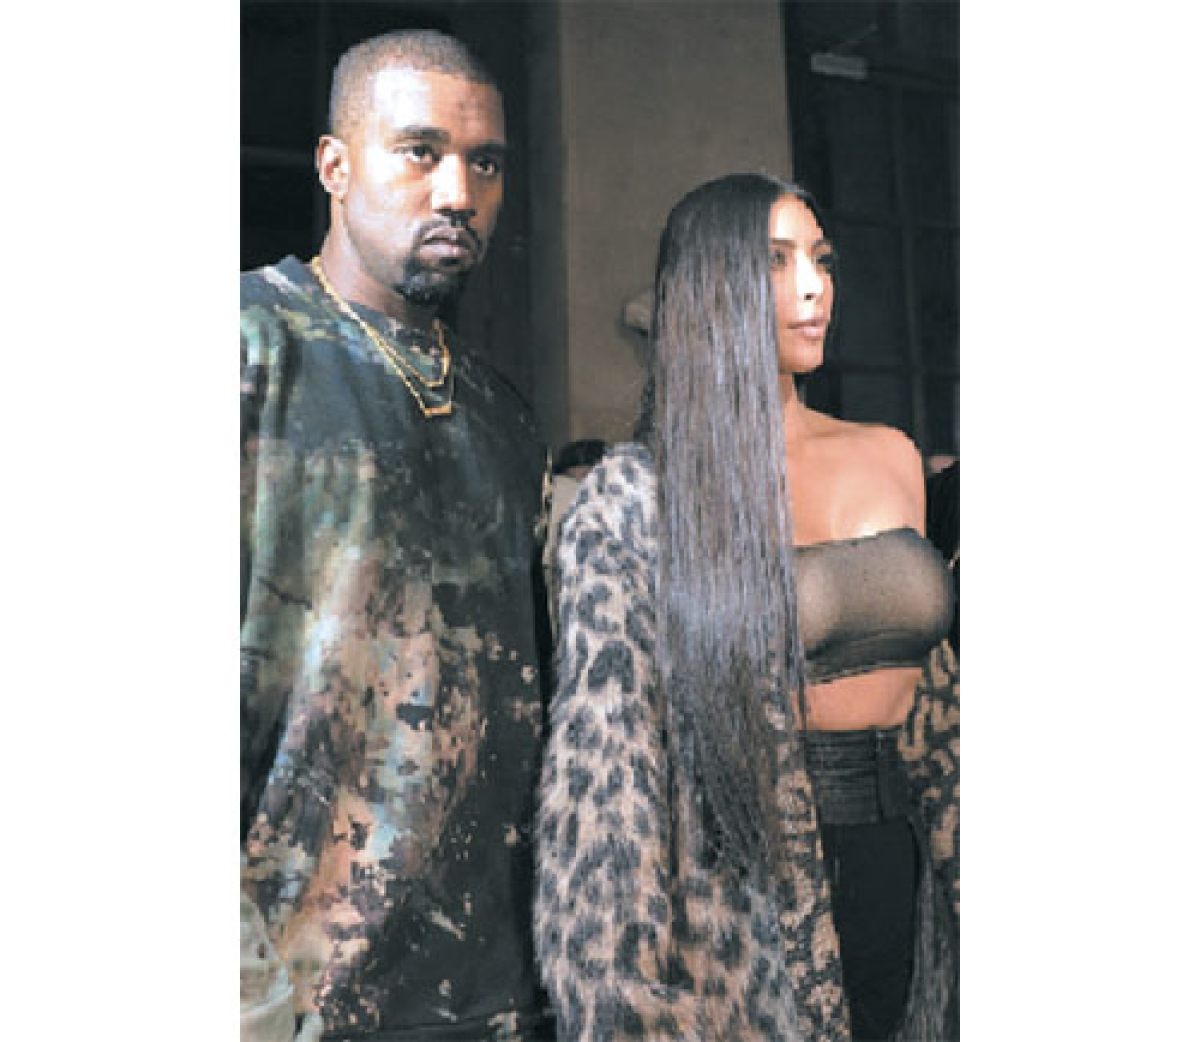 TV star Kim Kardashian robbed at gunpoint in Paris